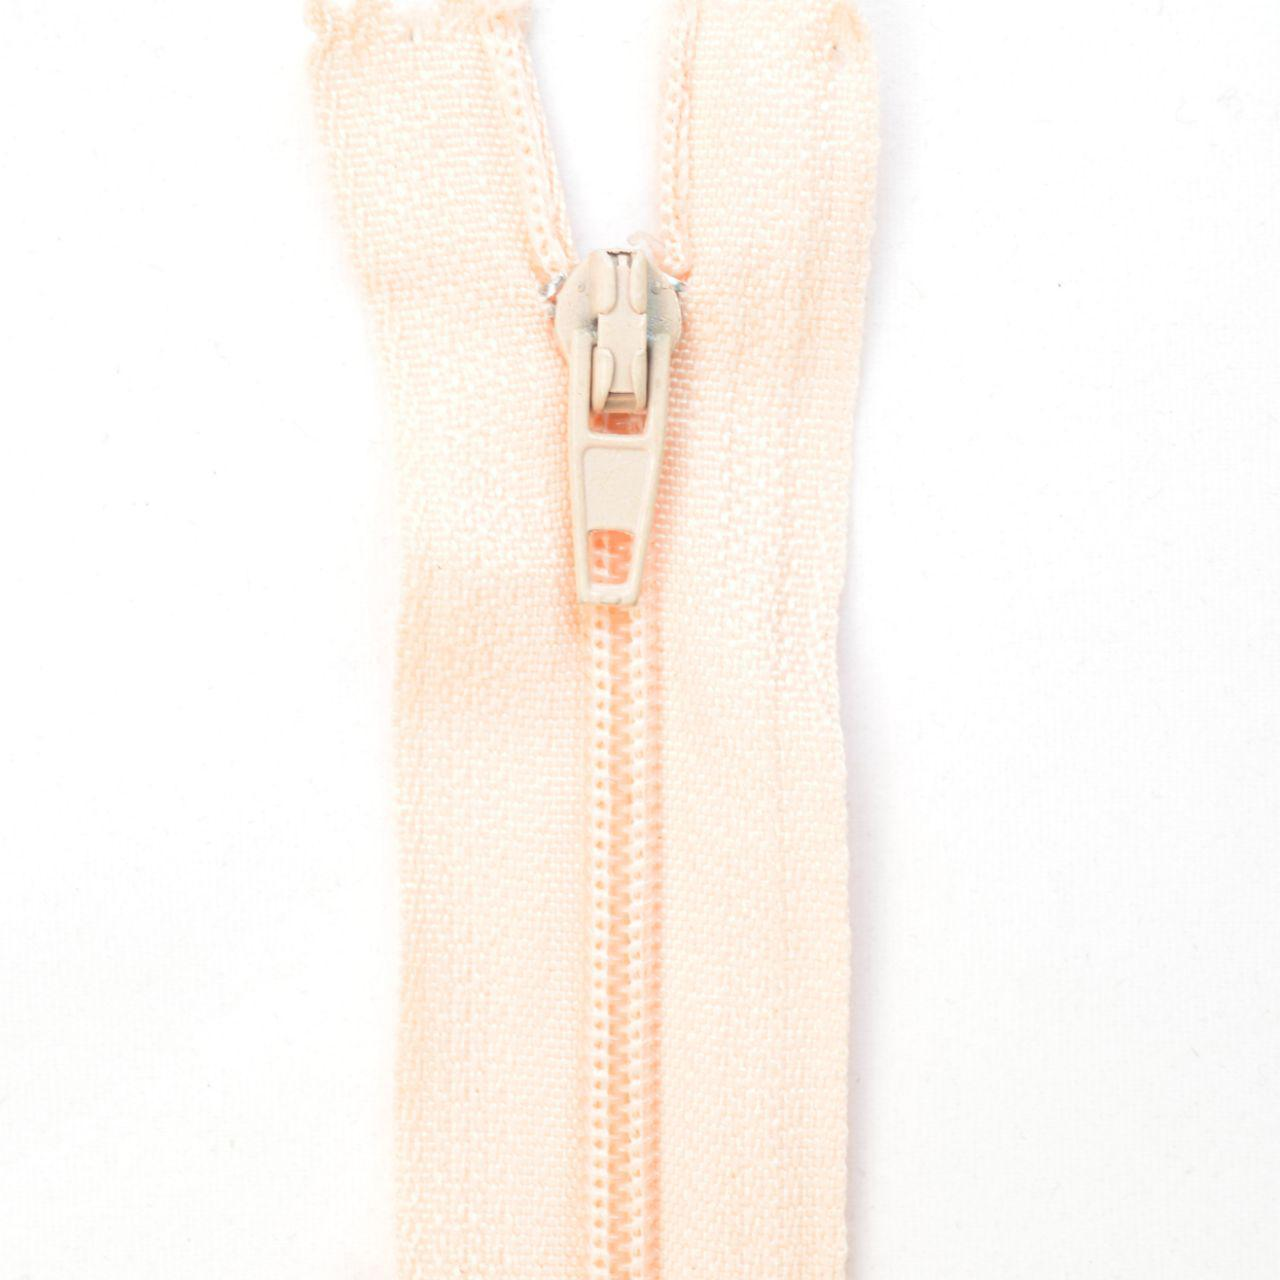 Молния юбка автомат 150 18см